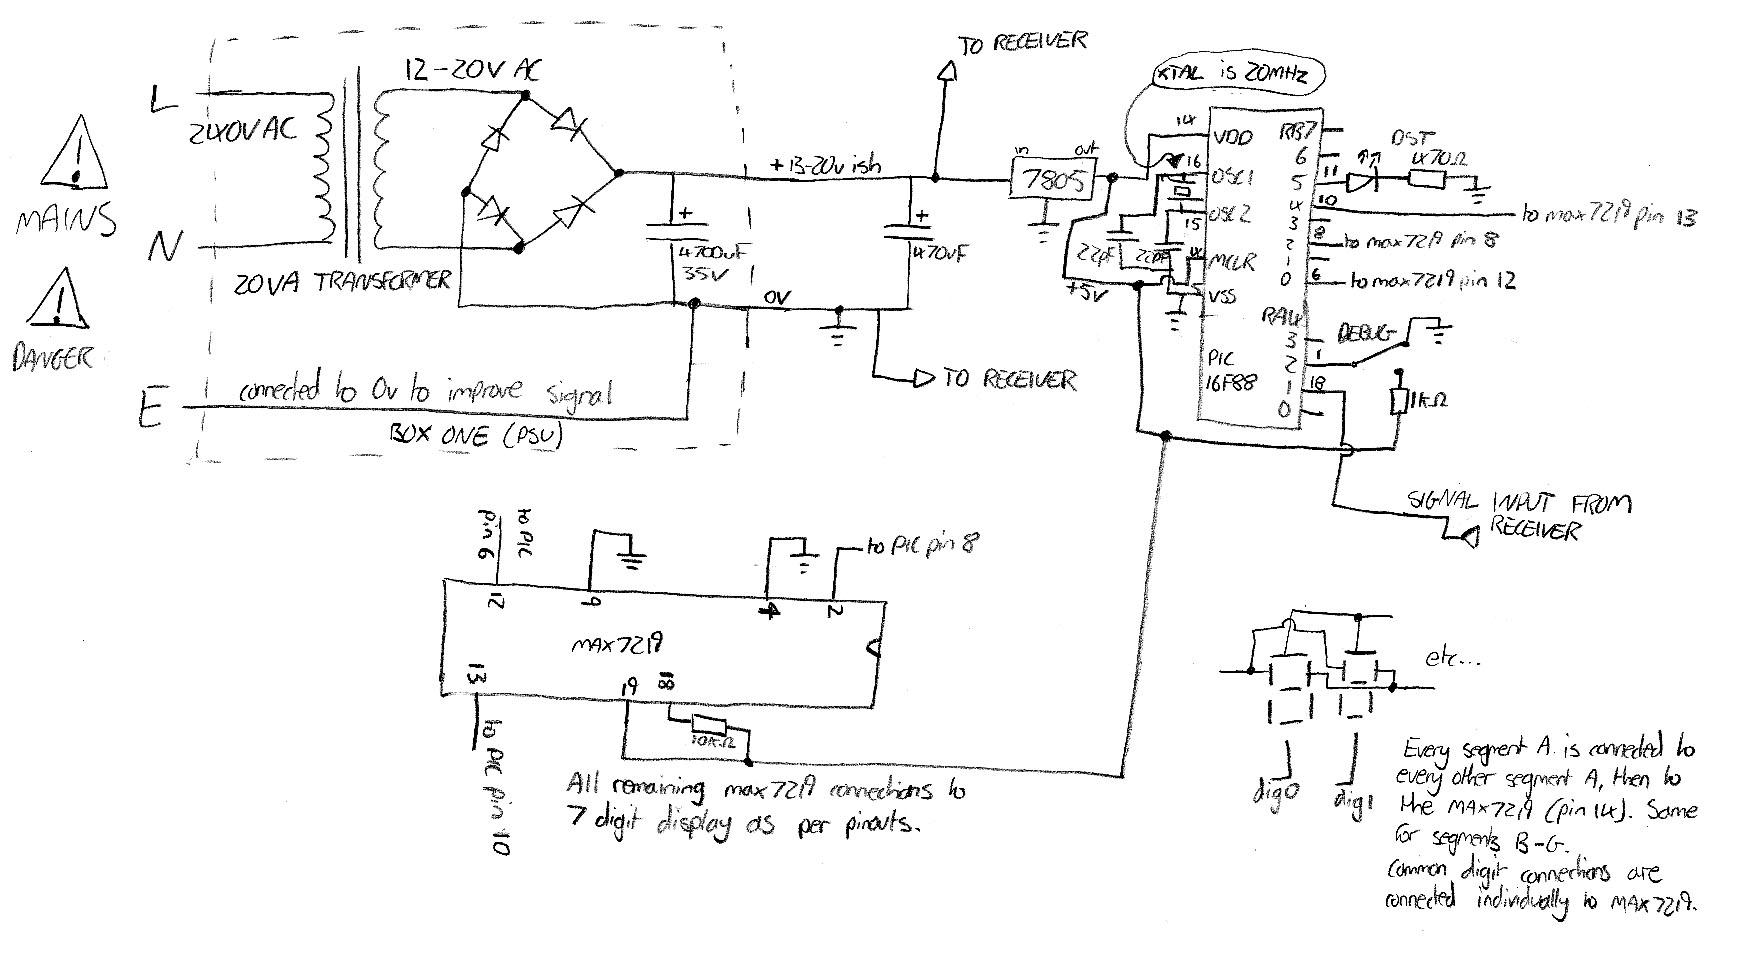 Rcd 300 Wiring Diagram Switch Schematics And Diagrams Rh Wiringdiagram Ruidea Org Alternating Current Vw